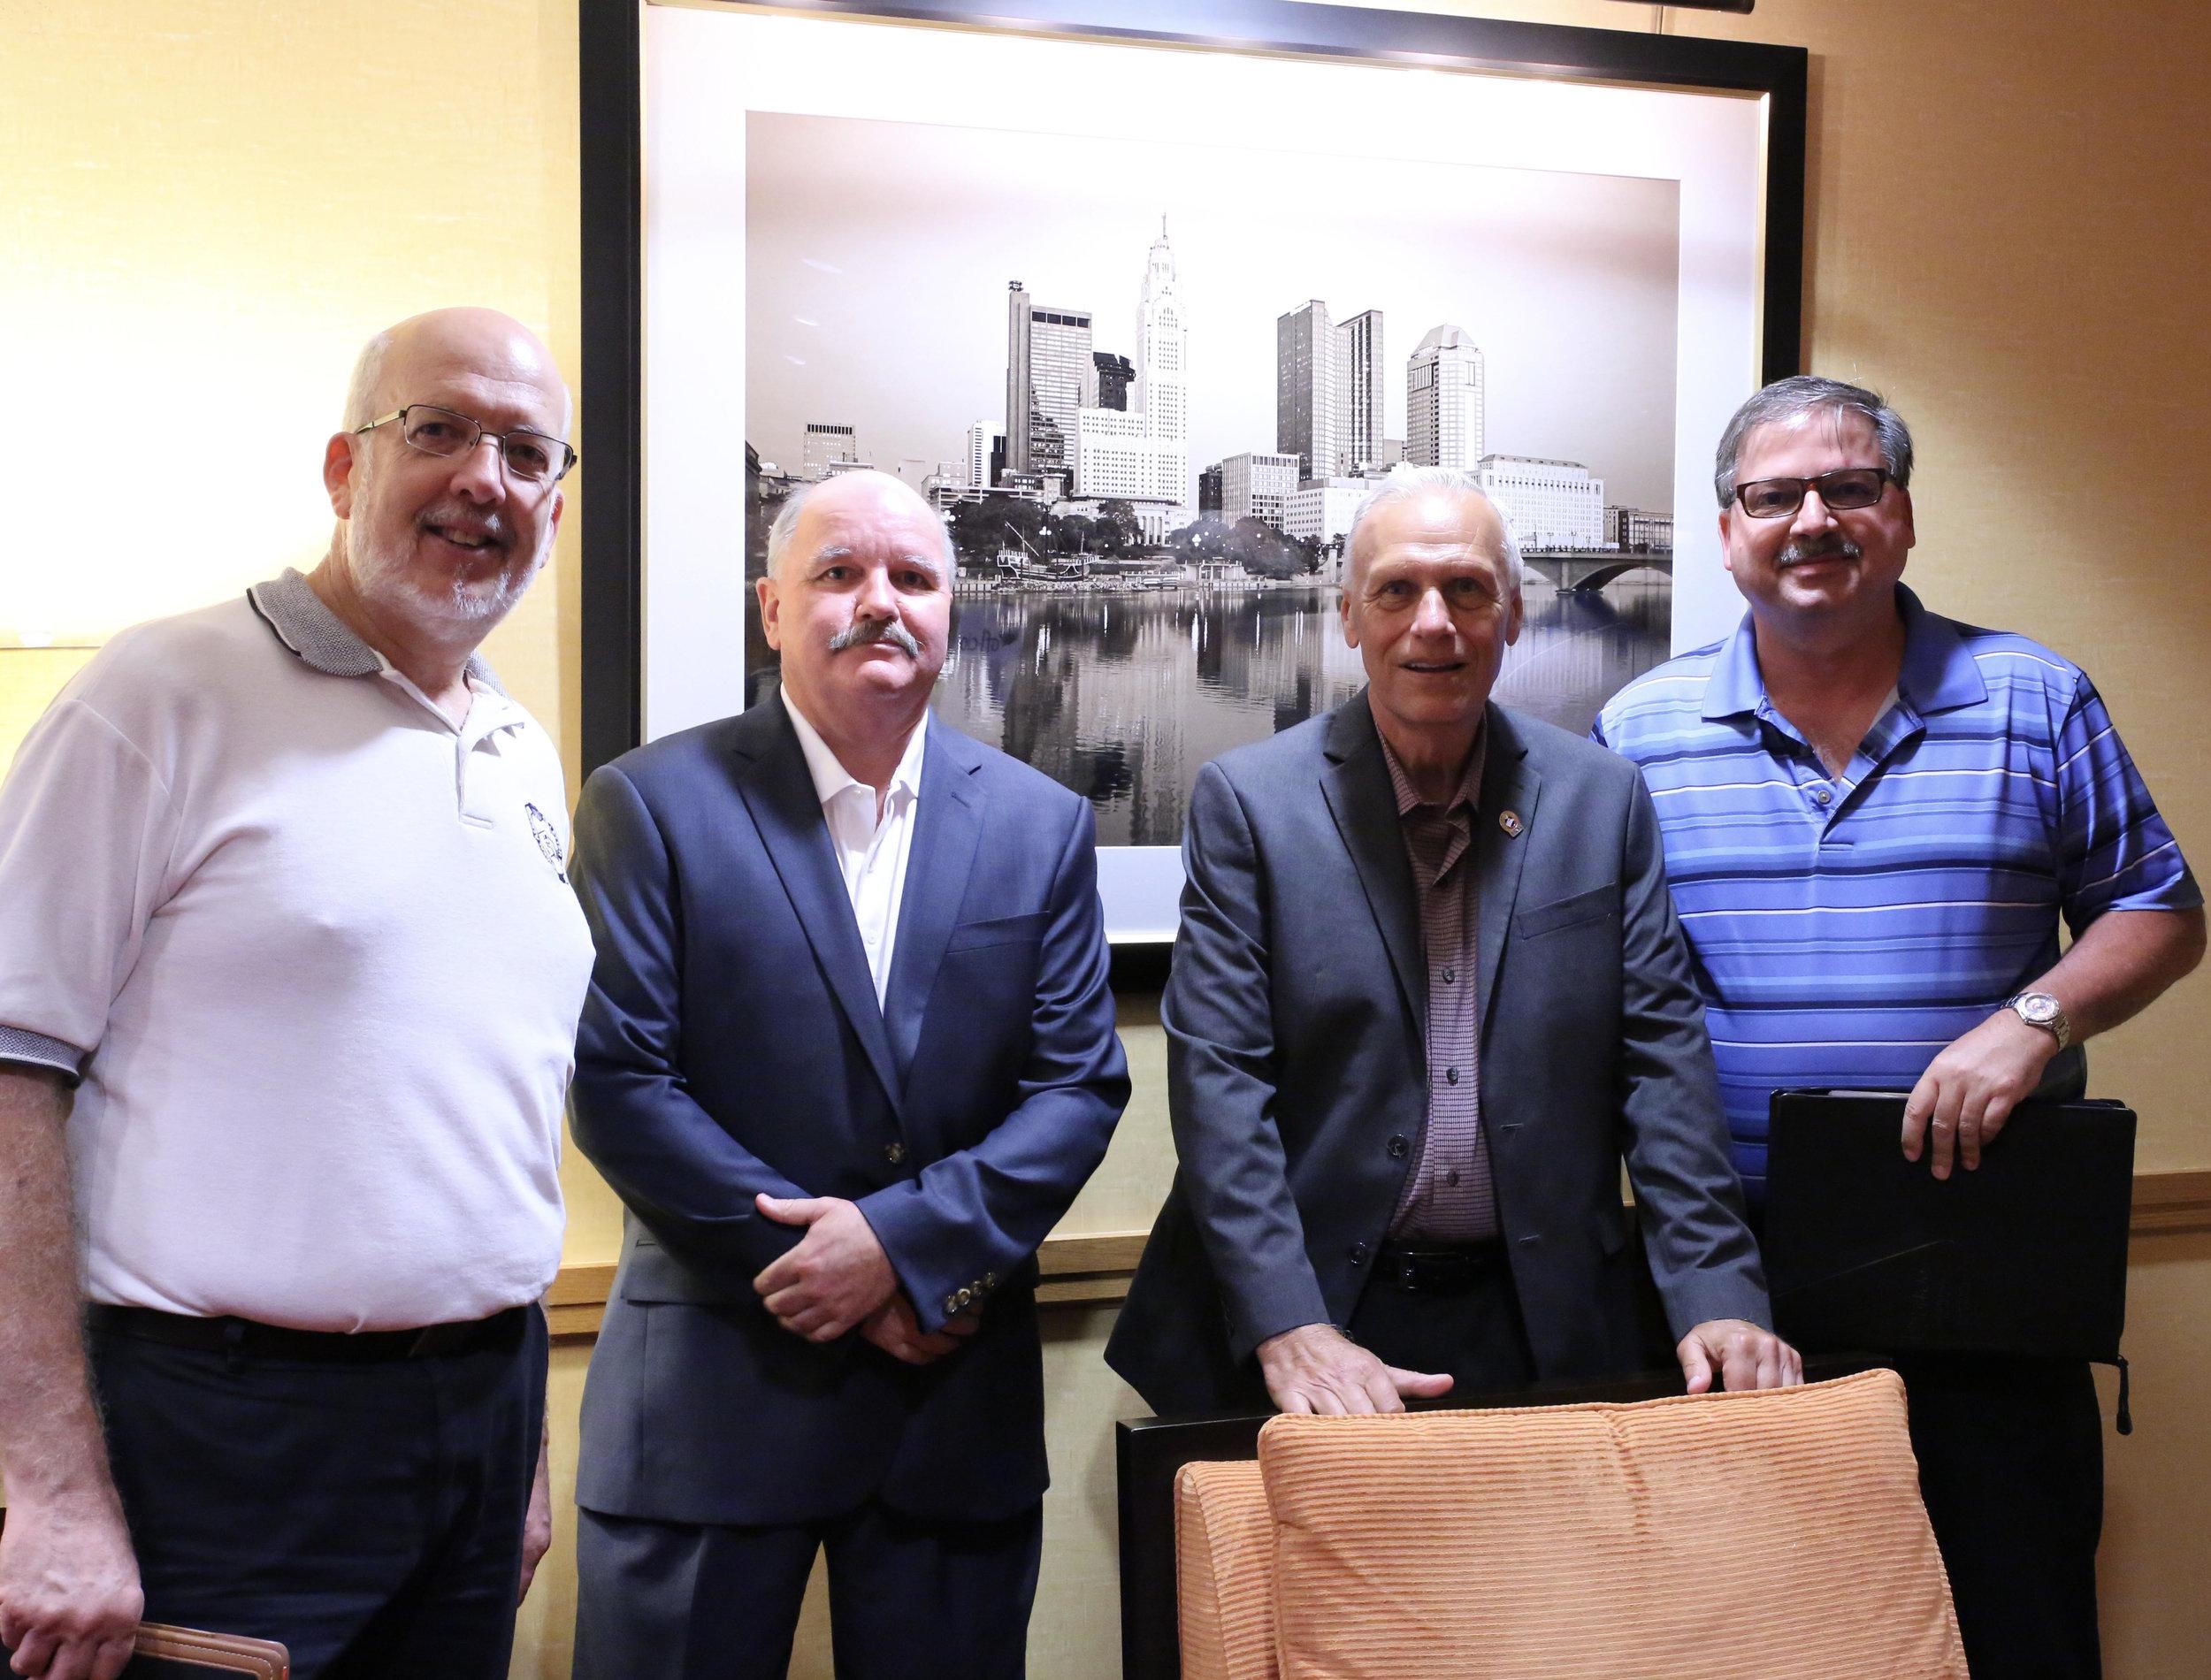 Dave Kennedy, Dave Herrod, John Dyce, Todd Hornyak